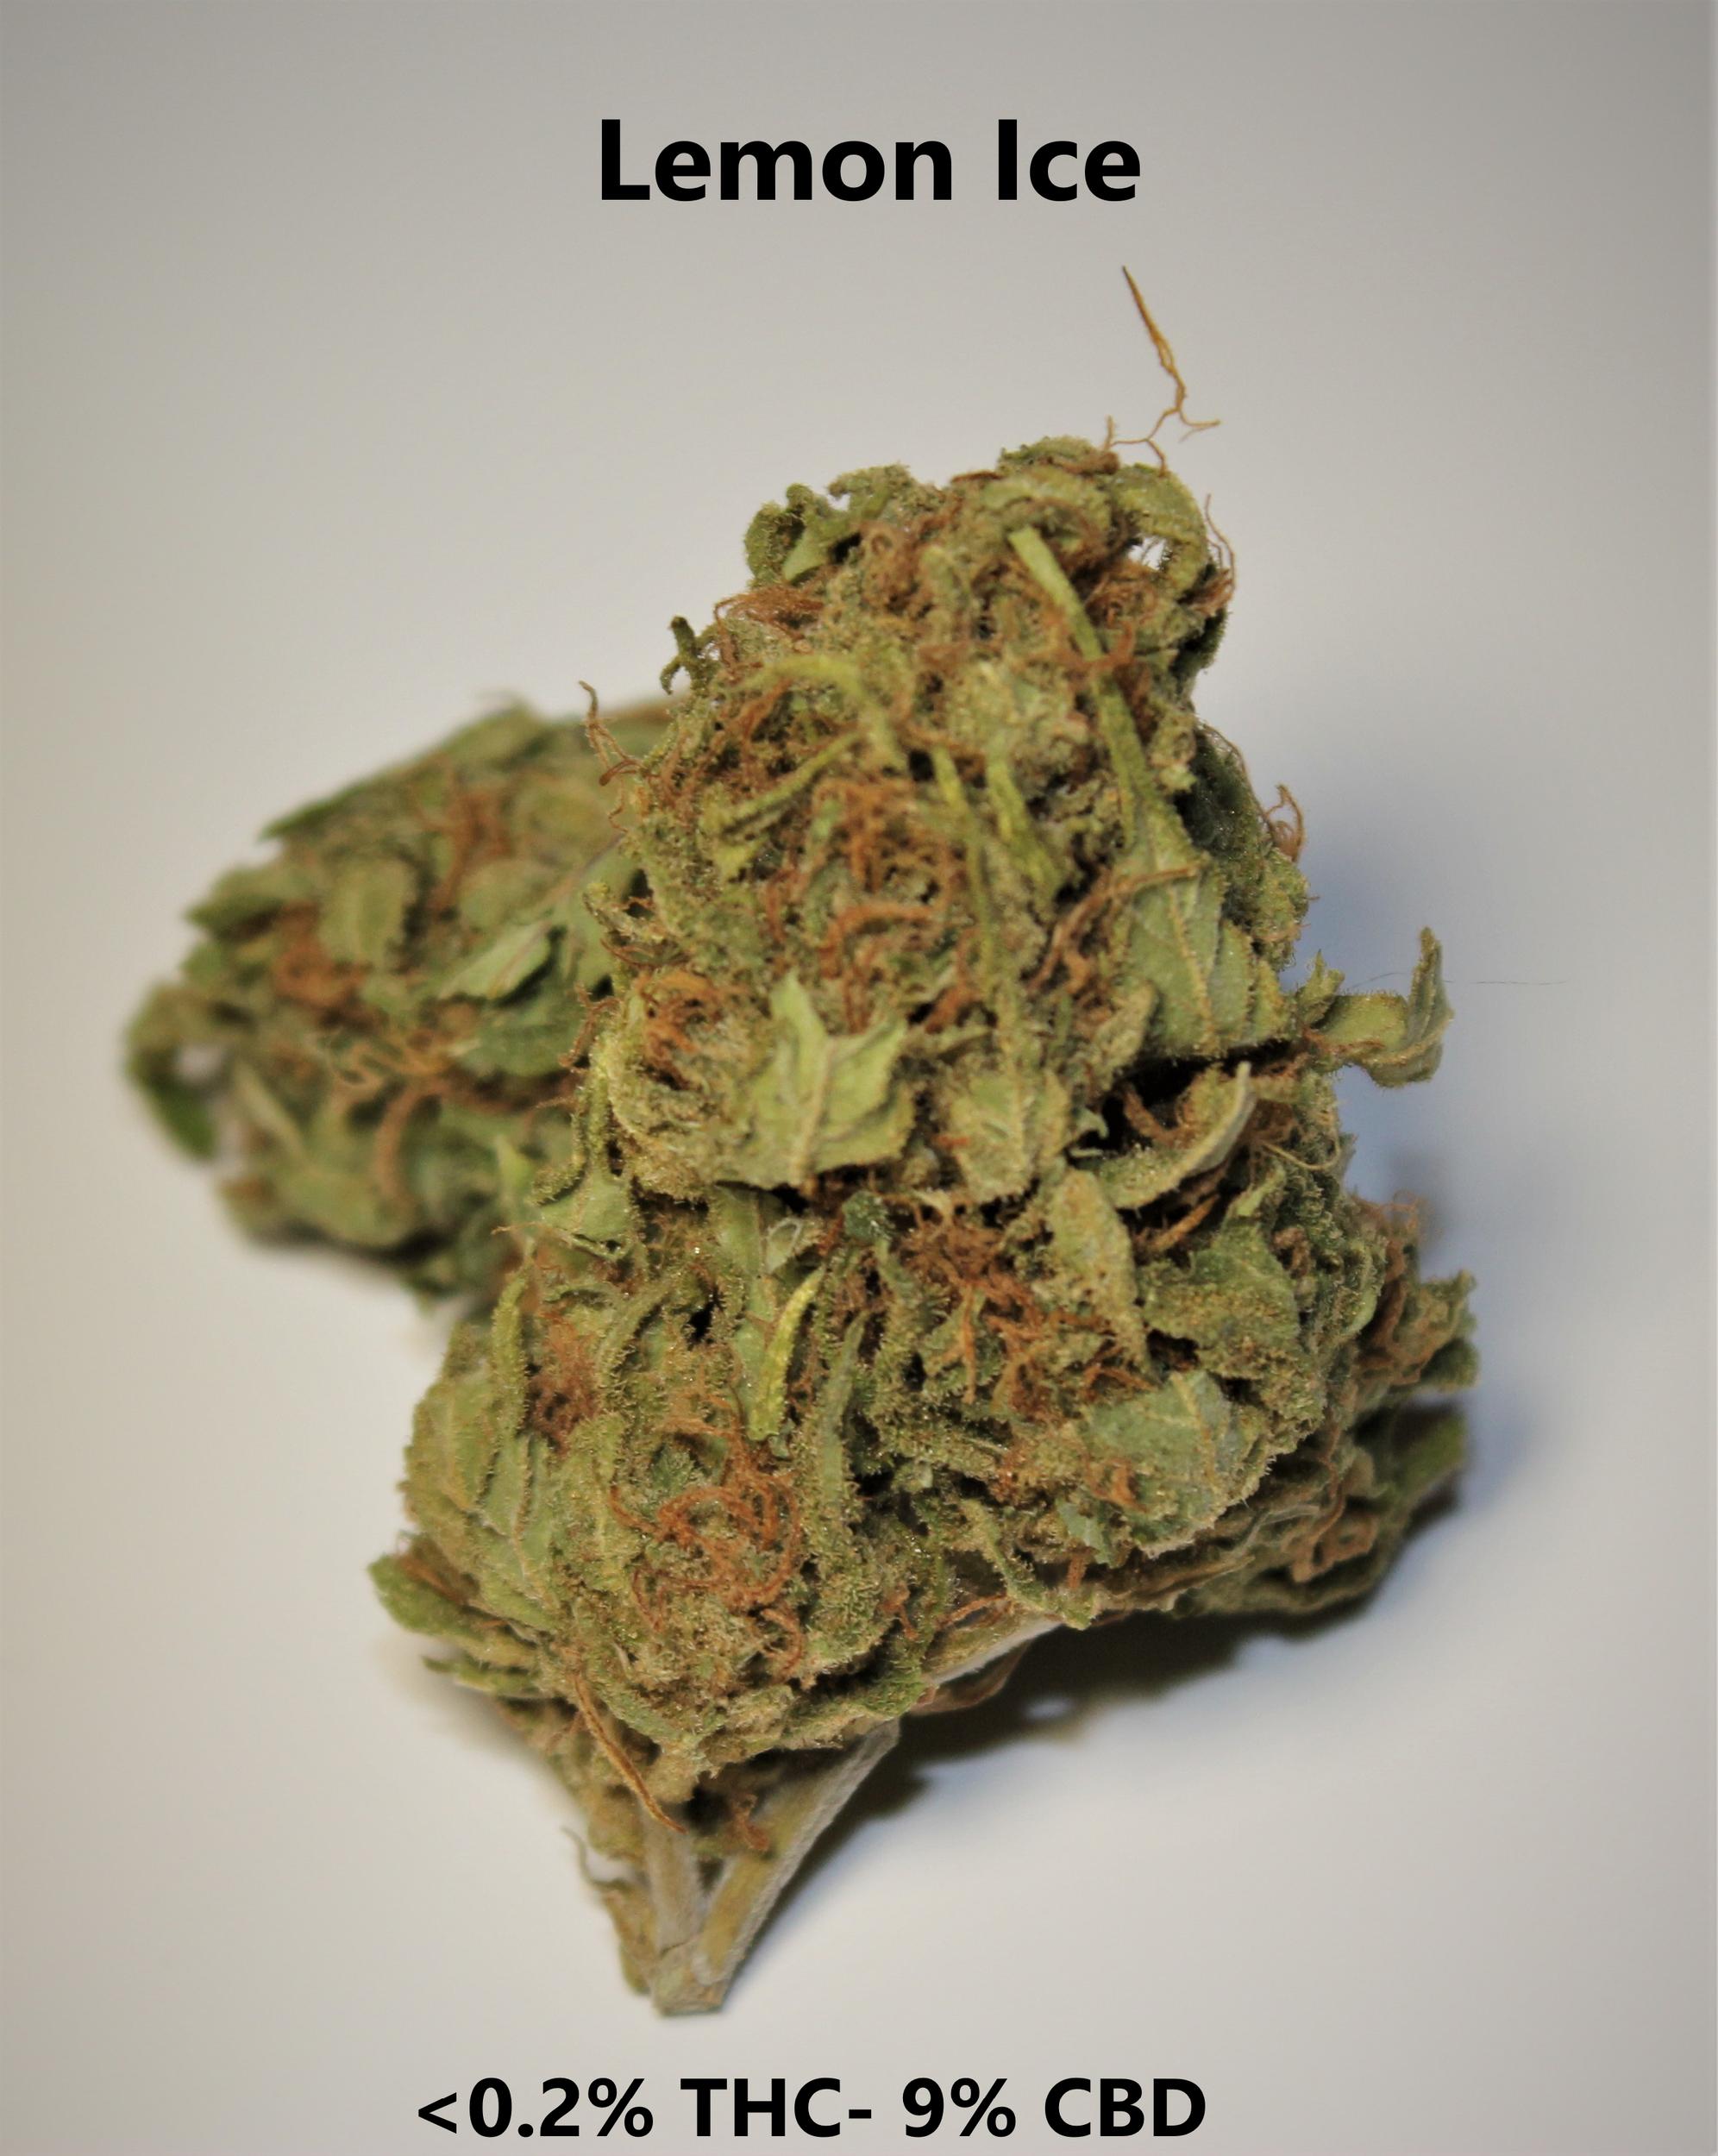 Lemon Ice   <0.2% THC / 9% CBD